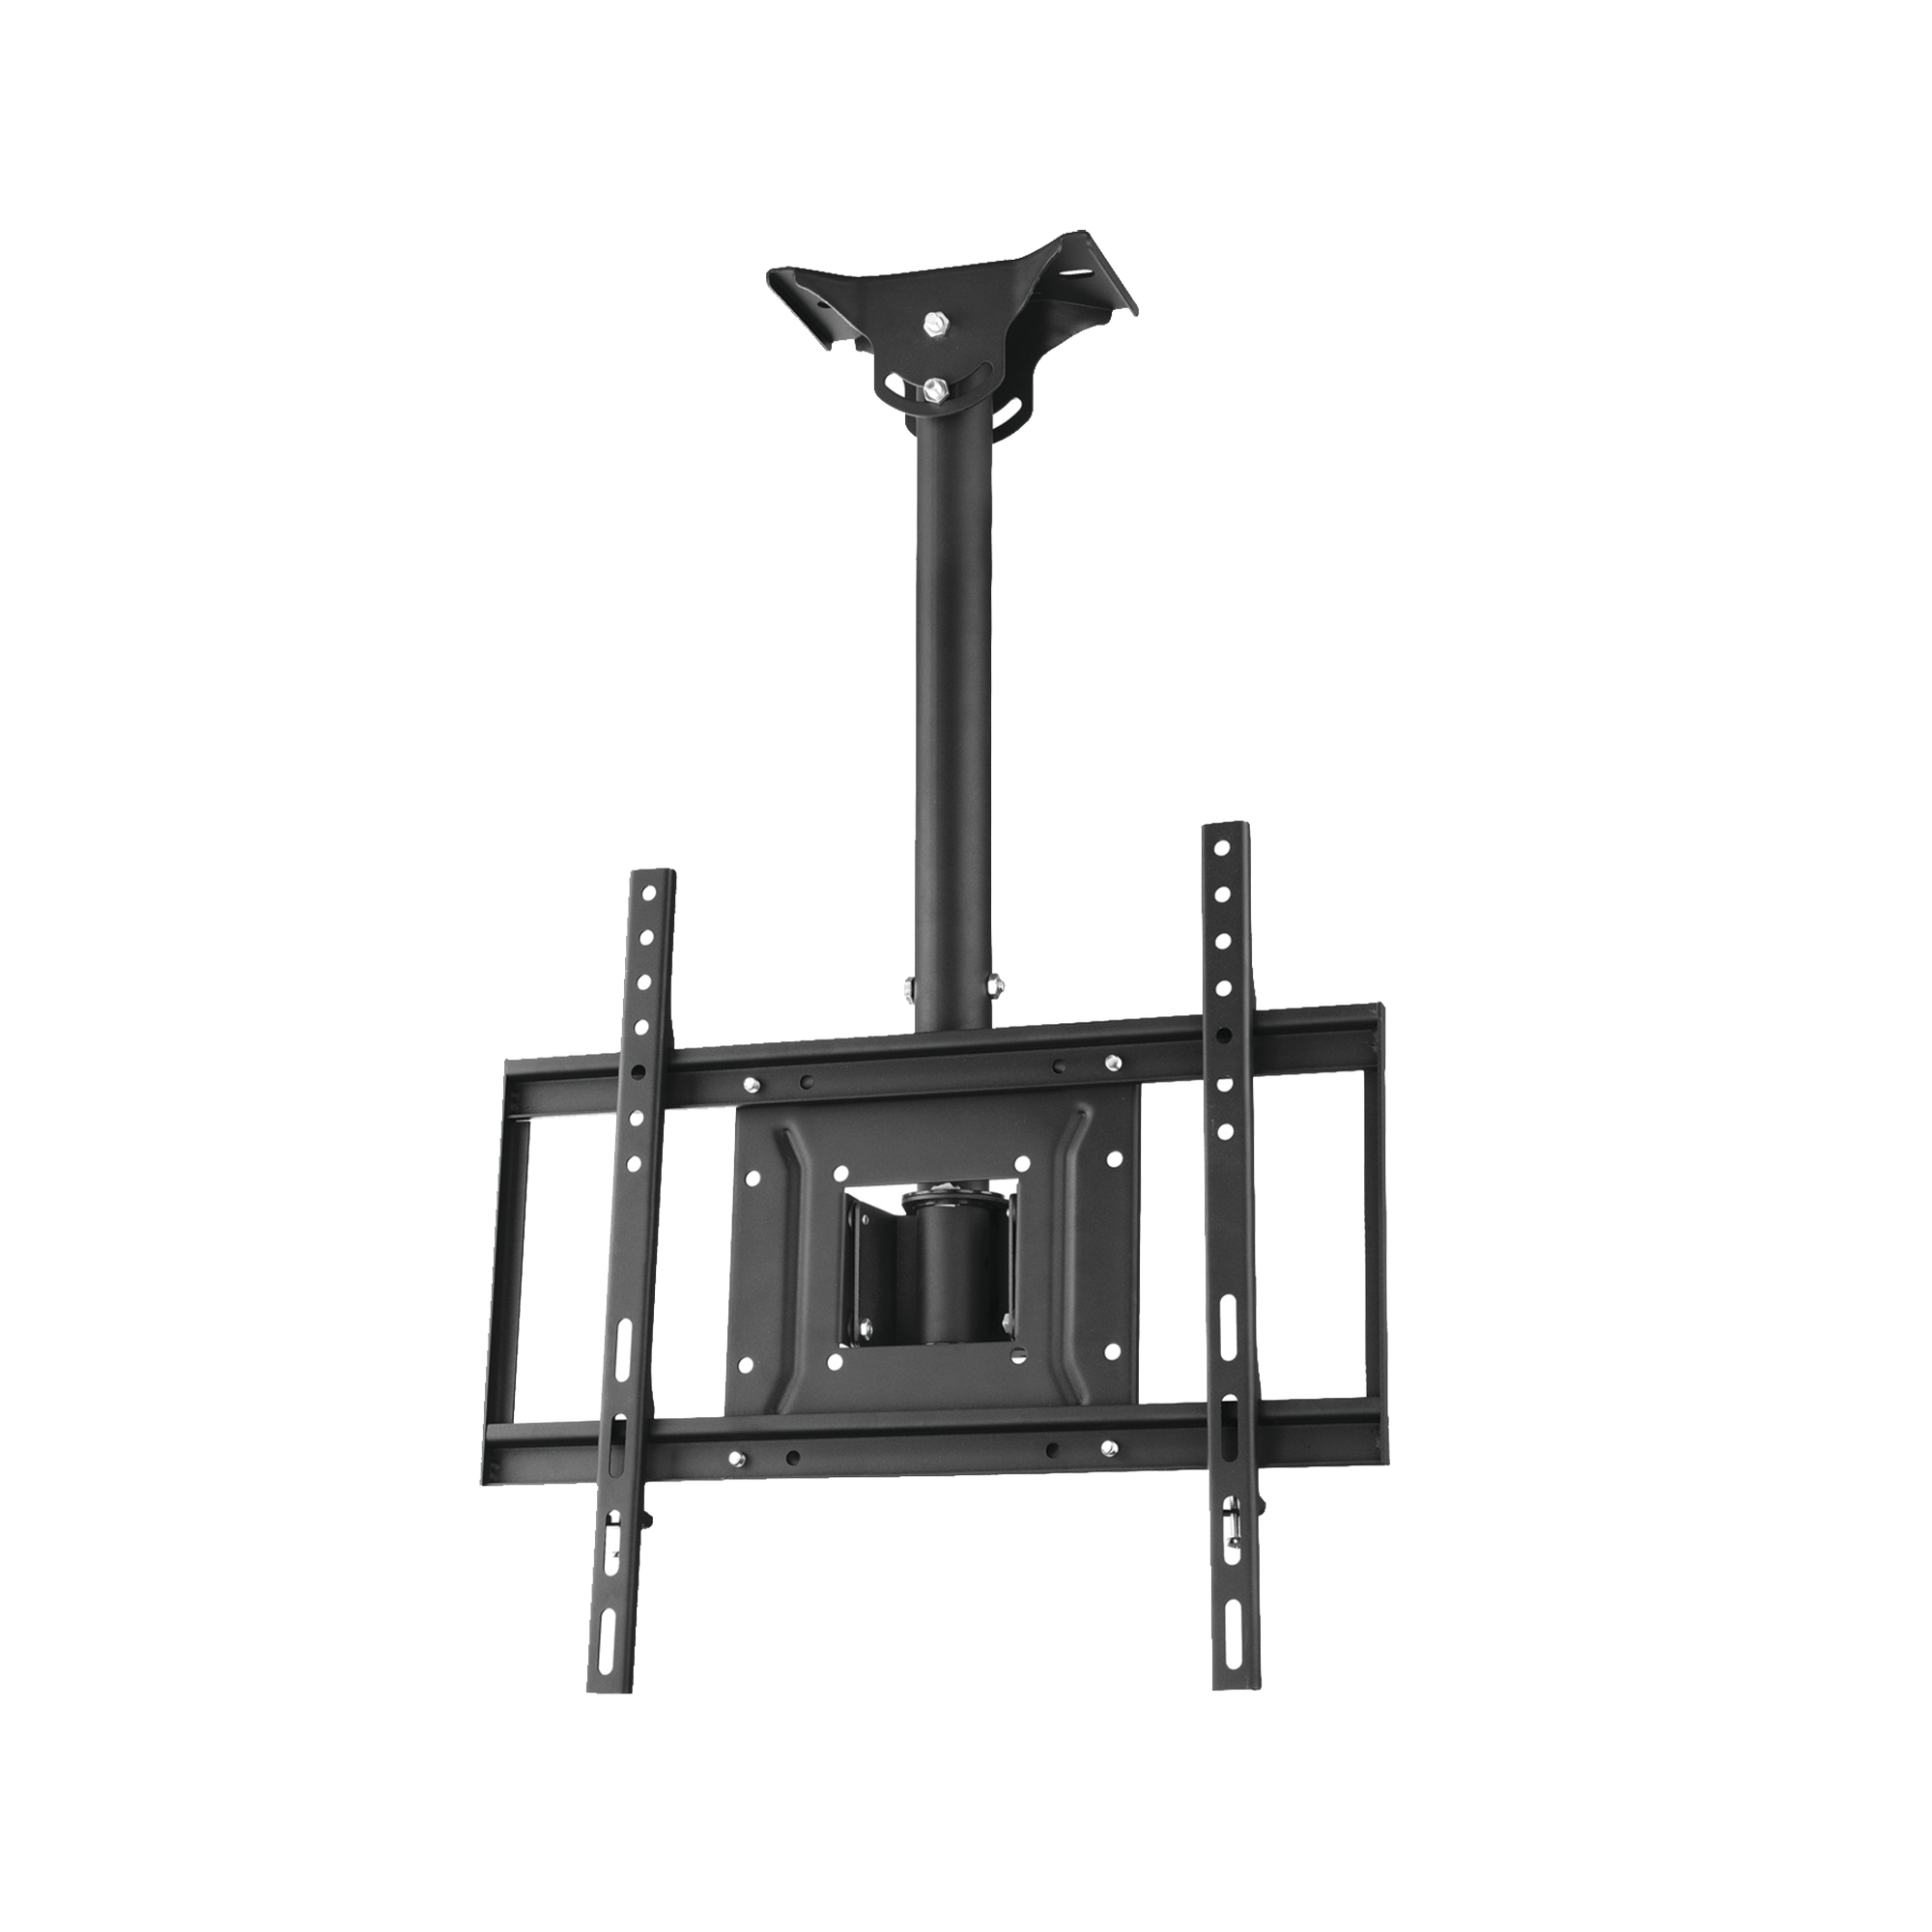 Montaje de techo universal para monitores de 23 a 47, carga maxima 40kg, Vesa 400x400.